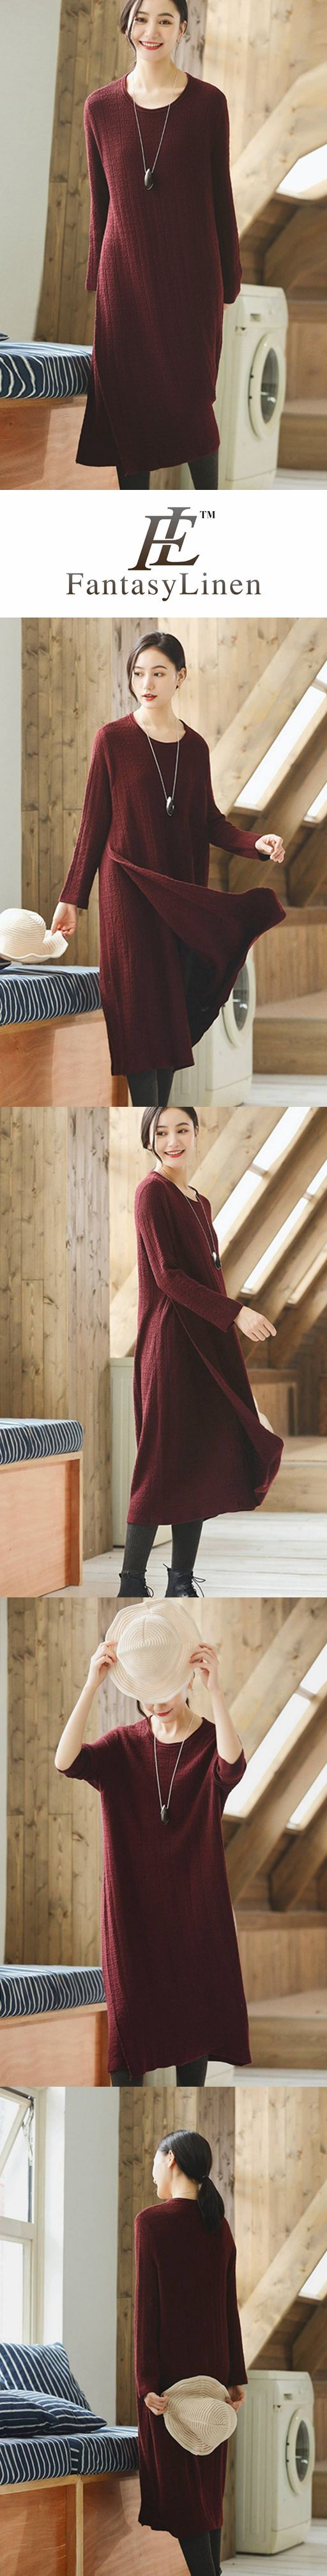 70f077db575 RED WOOL LONG WOMEN SWEATER DRESS OUTFIT ELEGANT KNIT DRESSES Q2691 ...